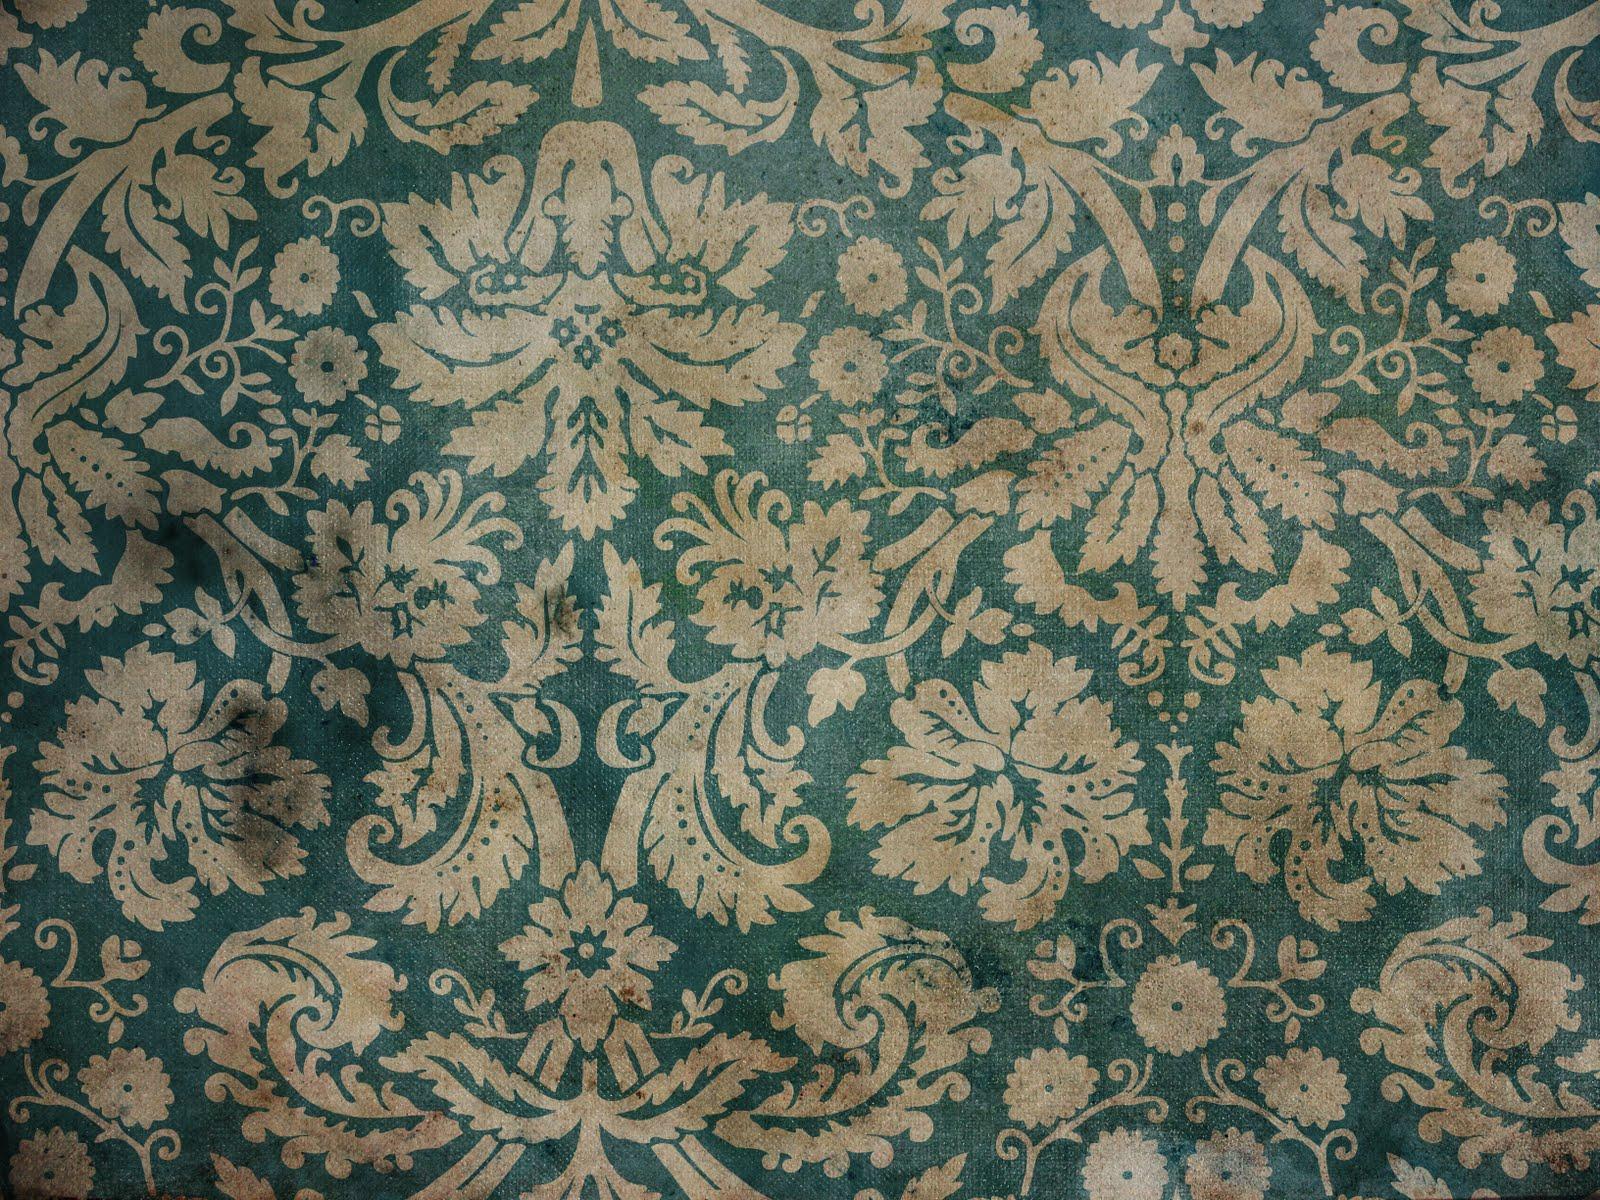 wallpaper pattern vintage - photo #3